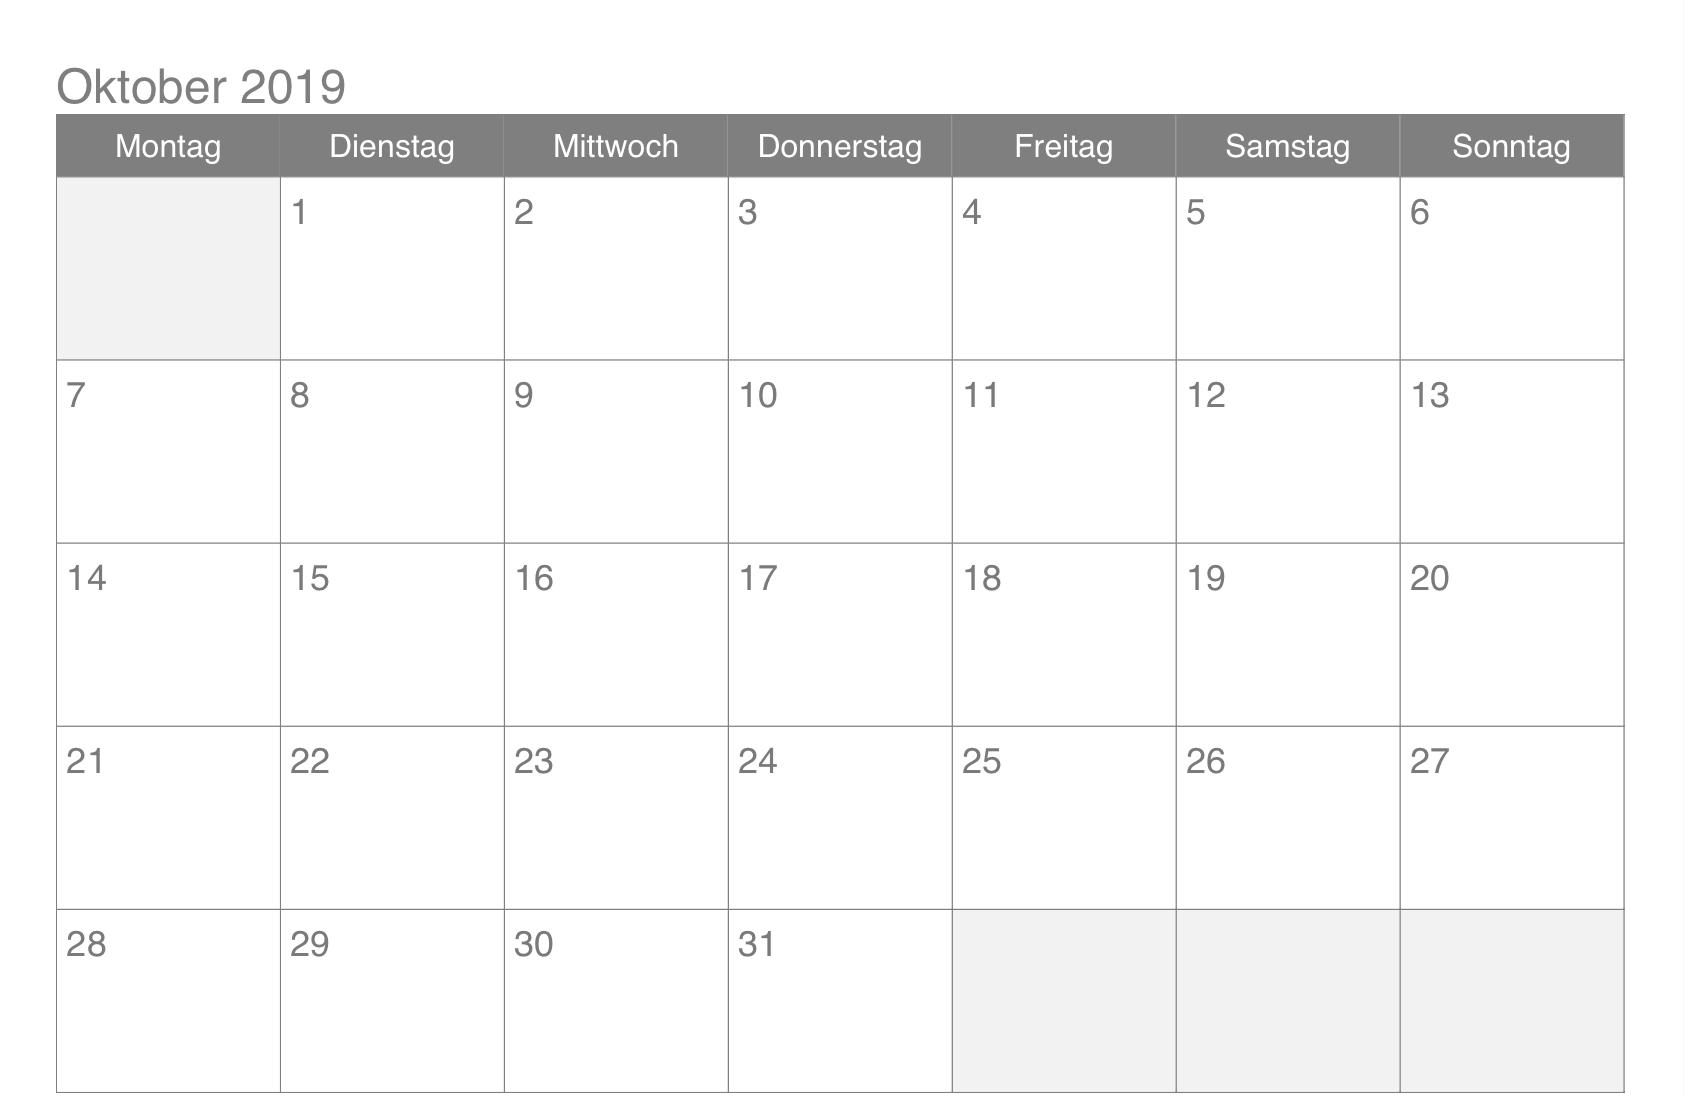 Oktober 2019 Kalender PDF